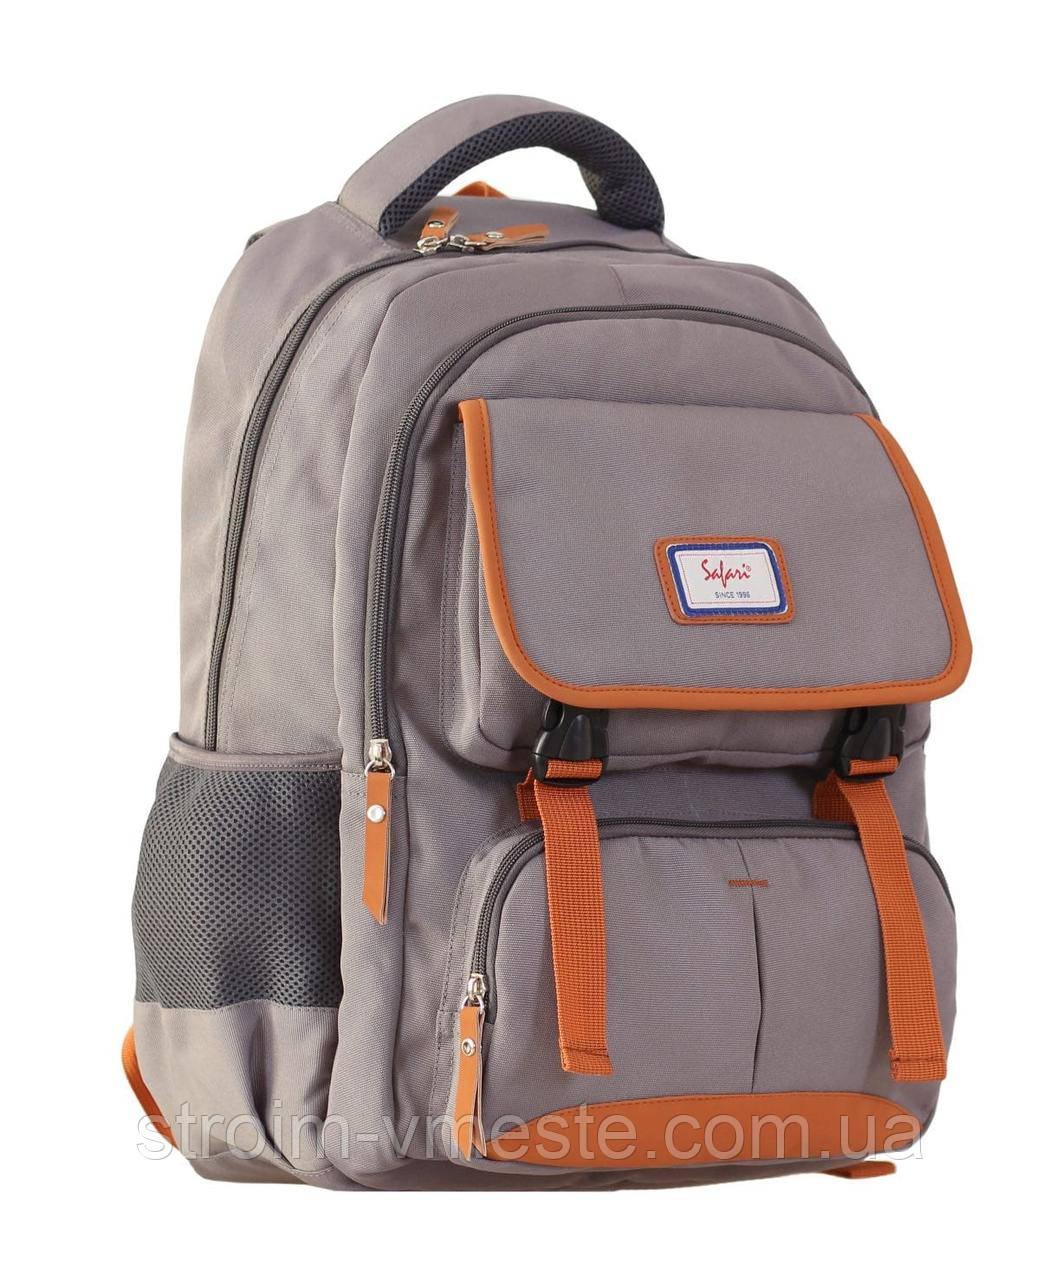 Рюкзак 3 отд 45*29*22 см 900D PL SAFARI Trend 1840